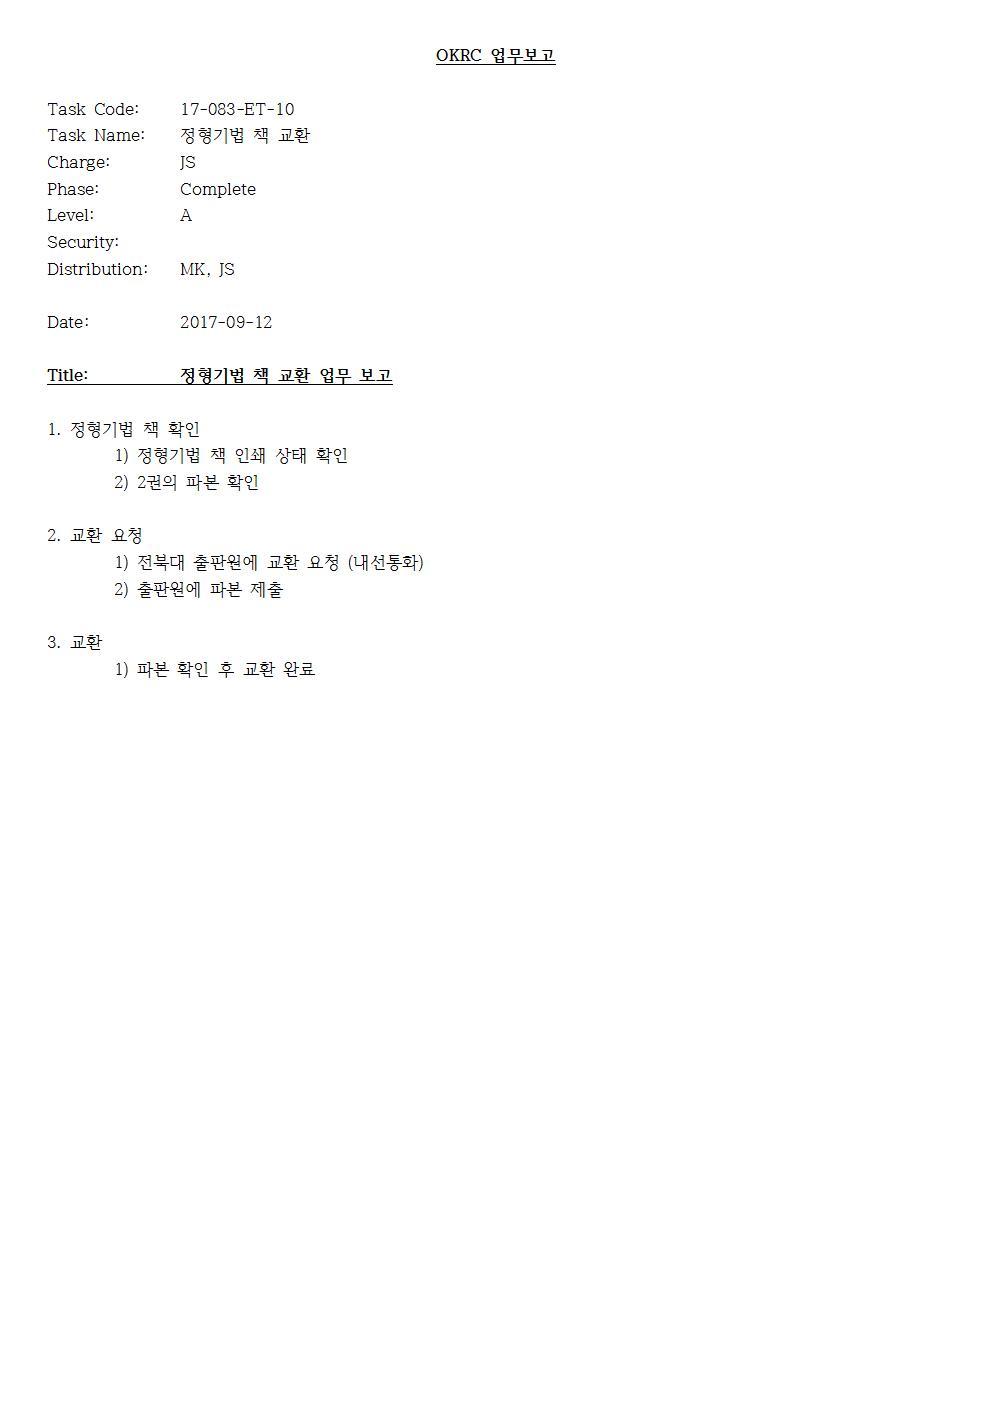 D-[17-083-ET-10]-[정형기법 책 교환]-[JS]-[2017-09-12]001.jpg